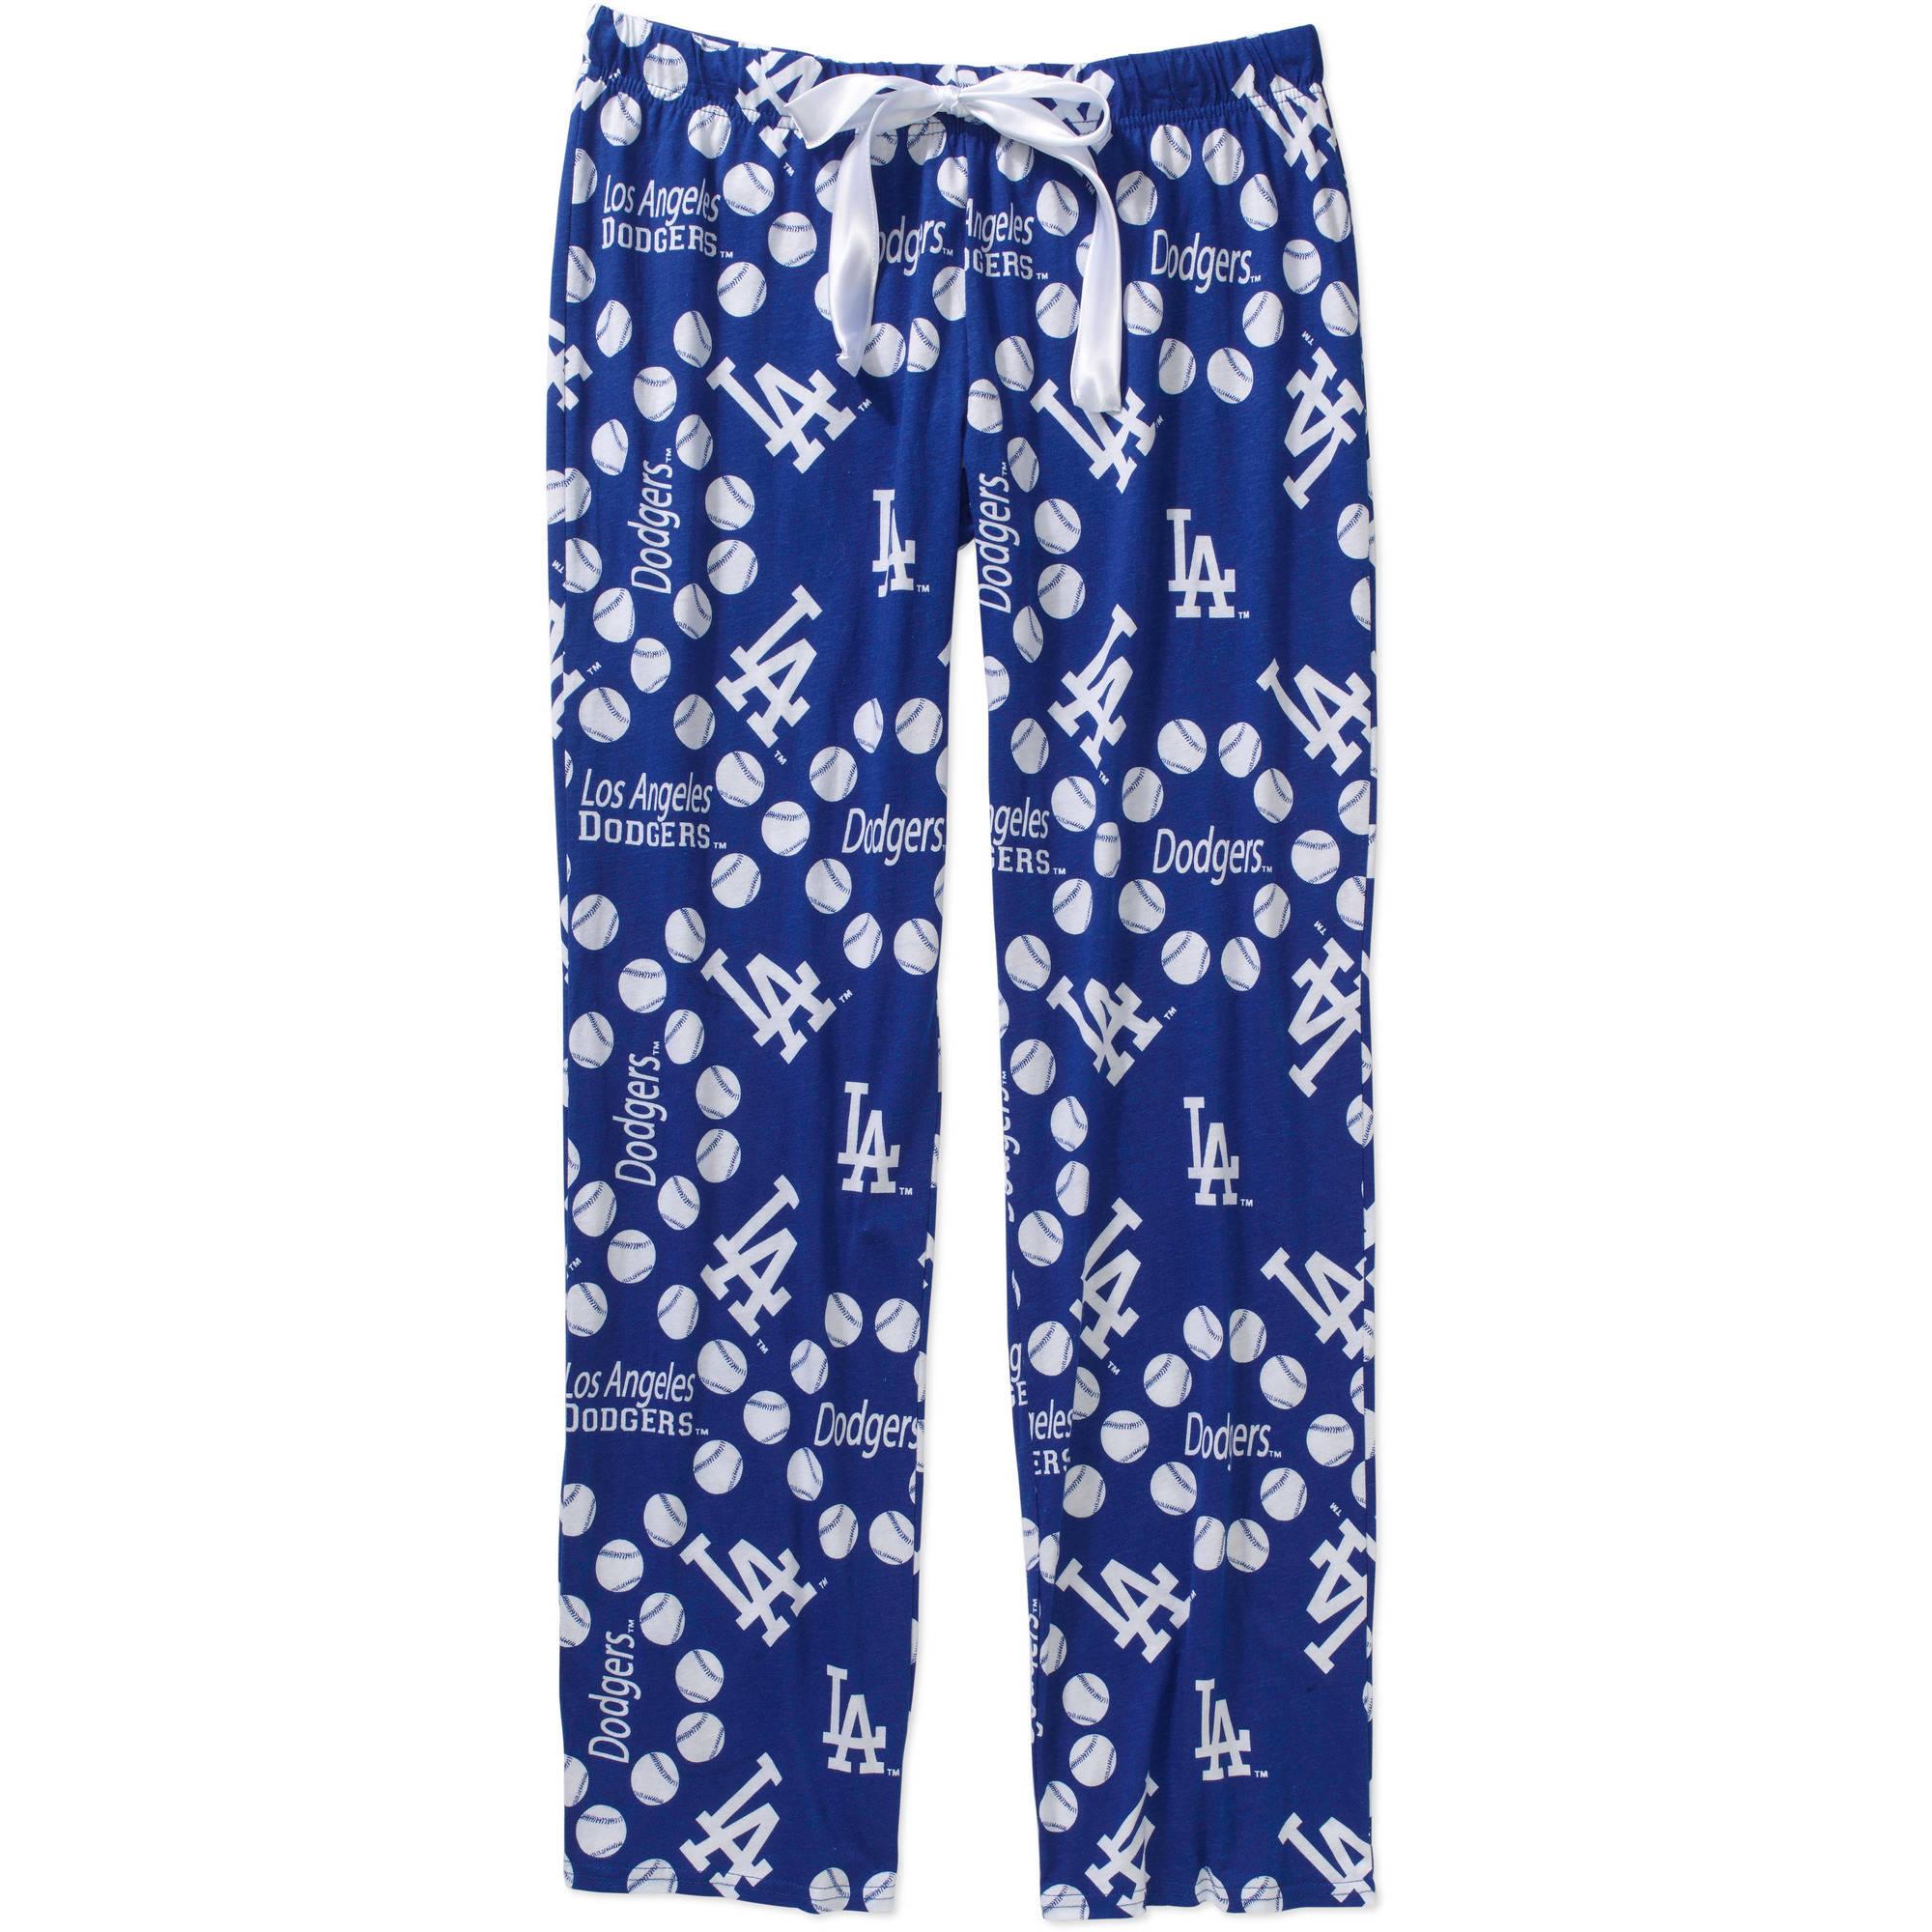 MLB Women's Los Angeles Dodgers Knit Sleep Pants